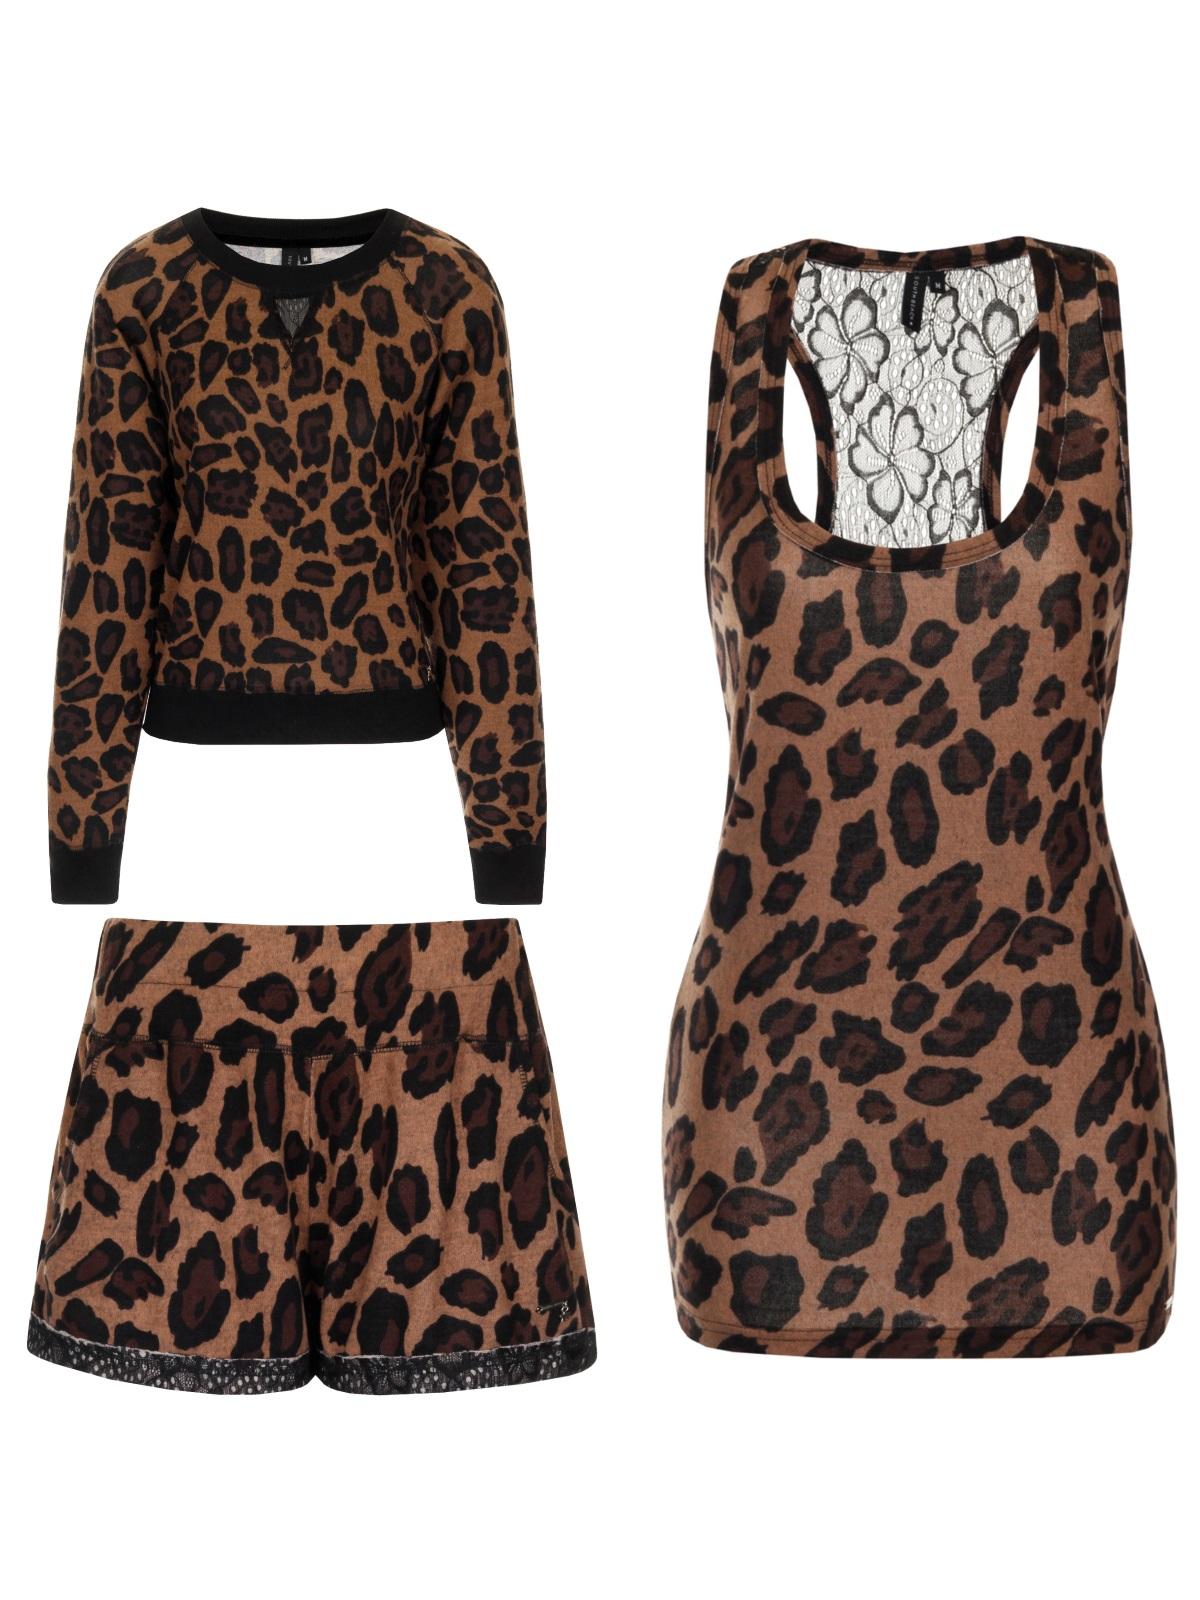 2ca3369fee Womens Leopard Print Lounge Range Shorts Robe Sweatshirt Lace Top Size UK  6-16